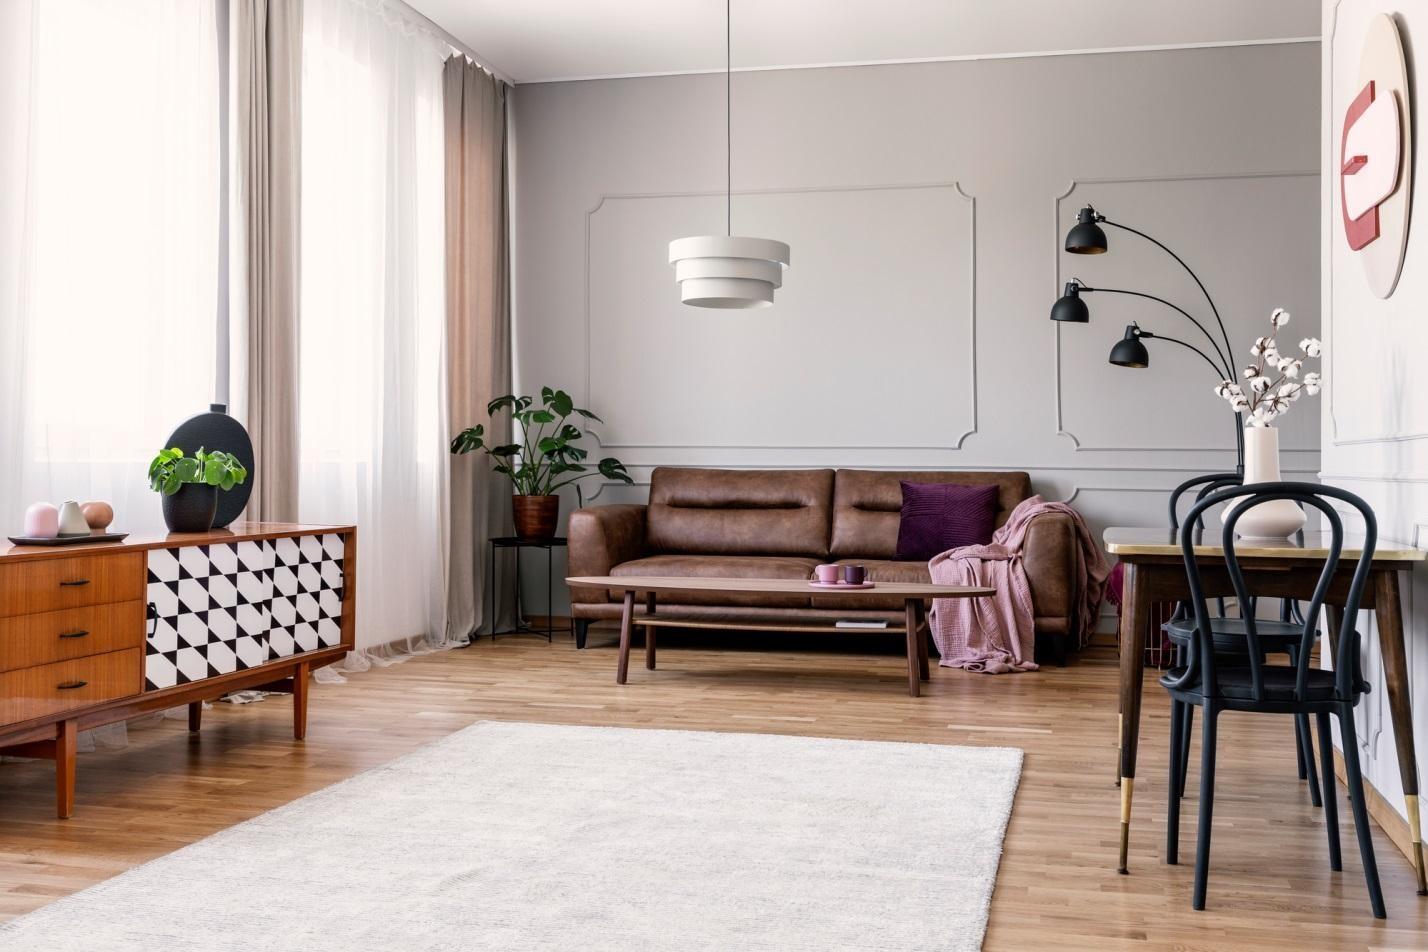 MCM Living Room Design Ideas